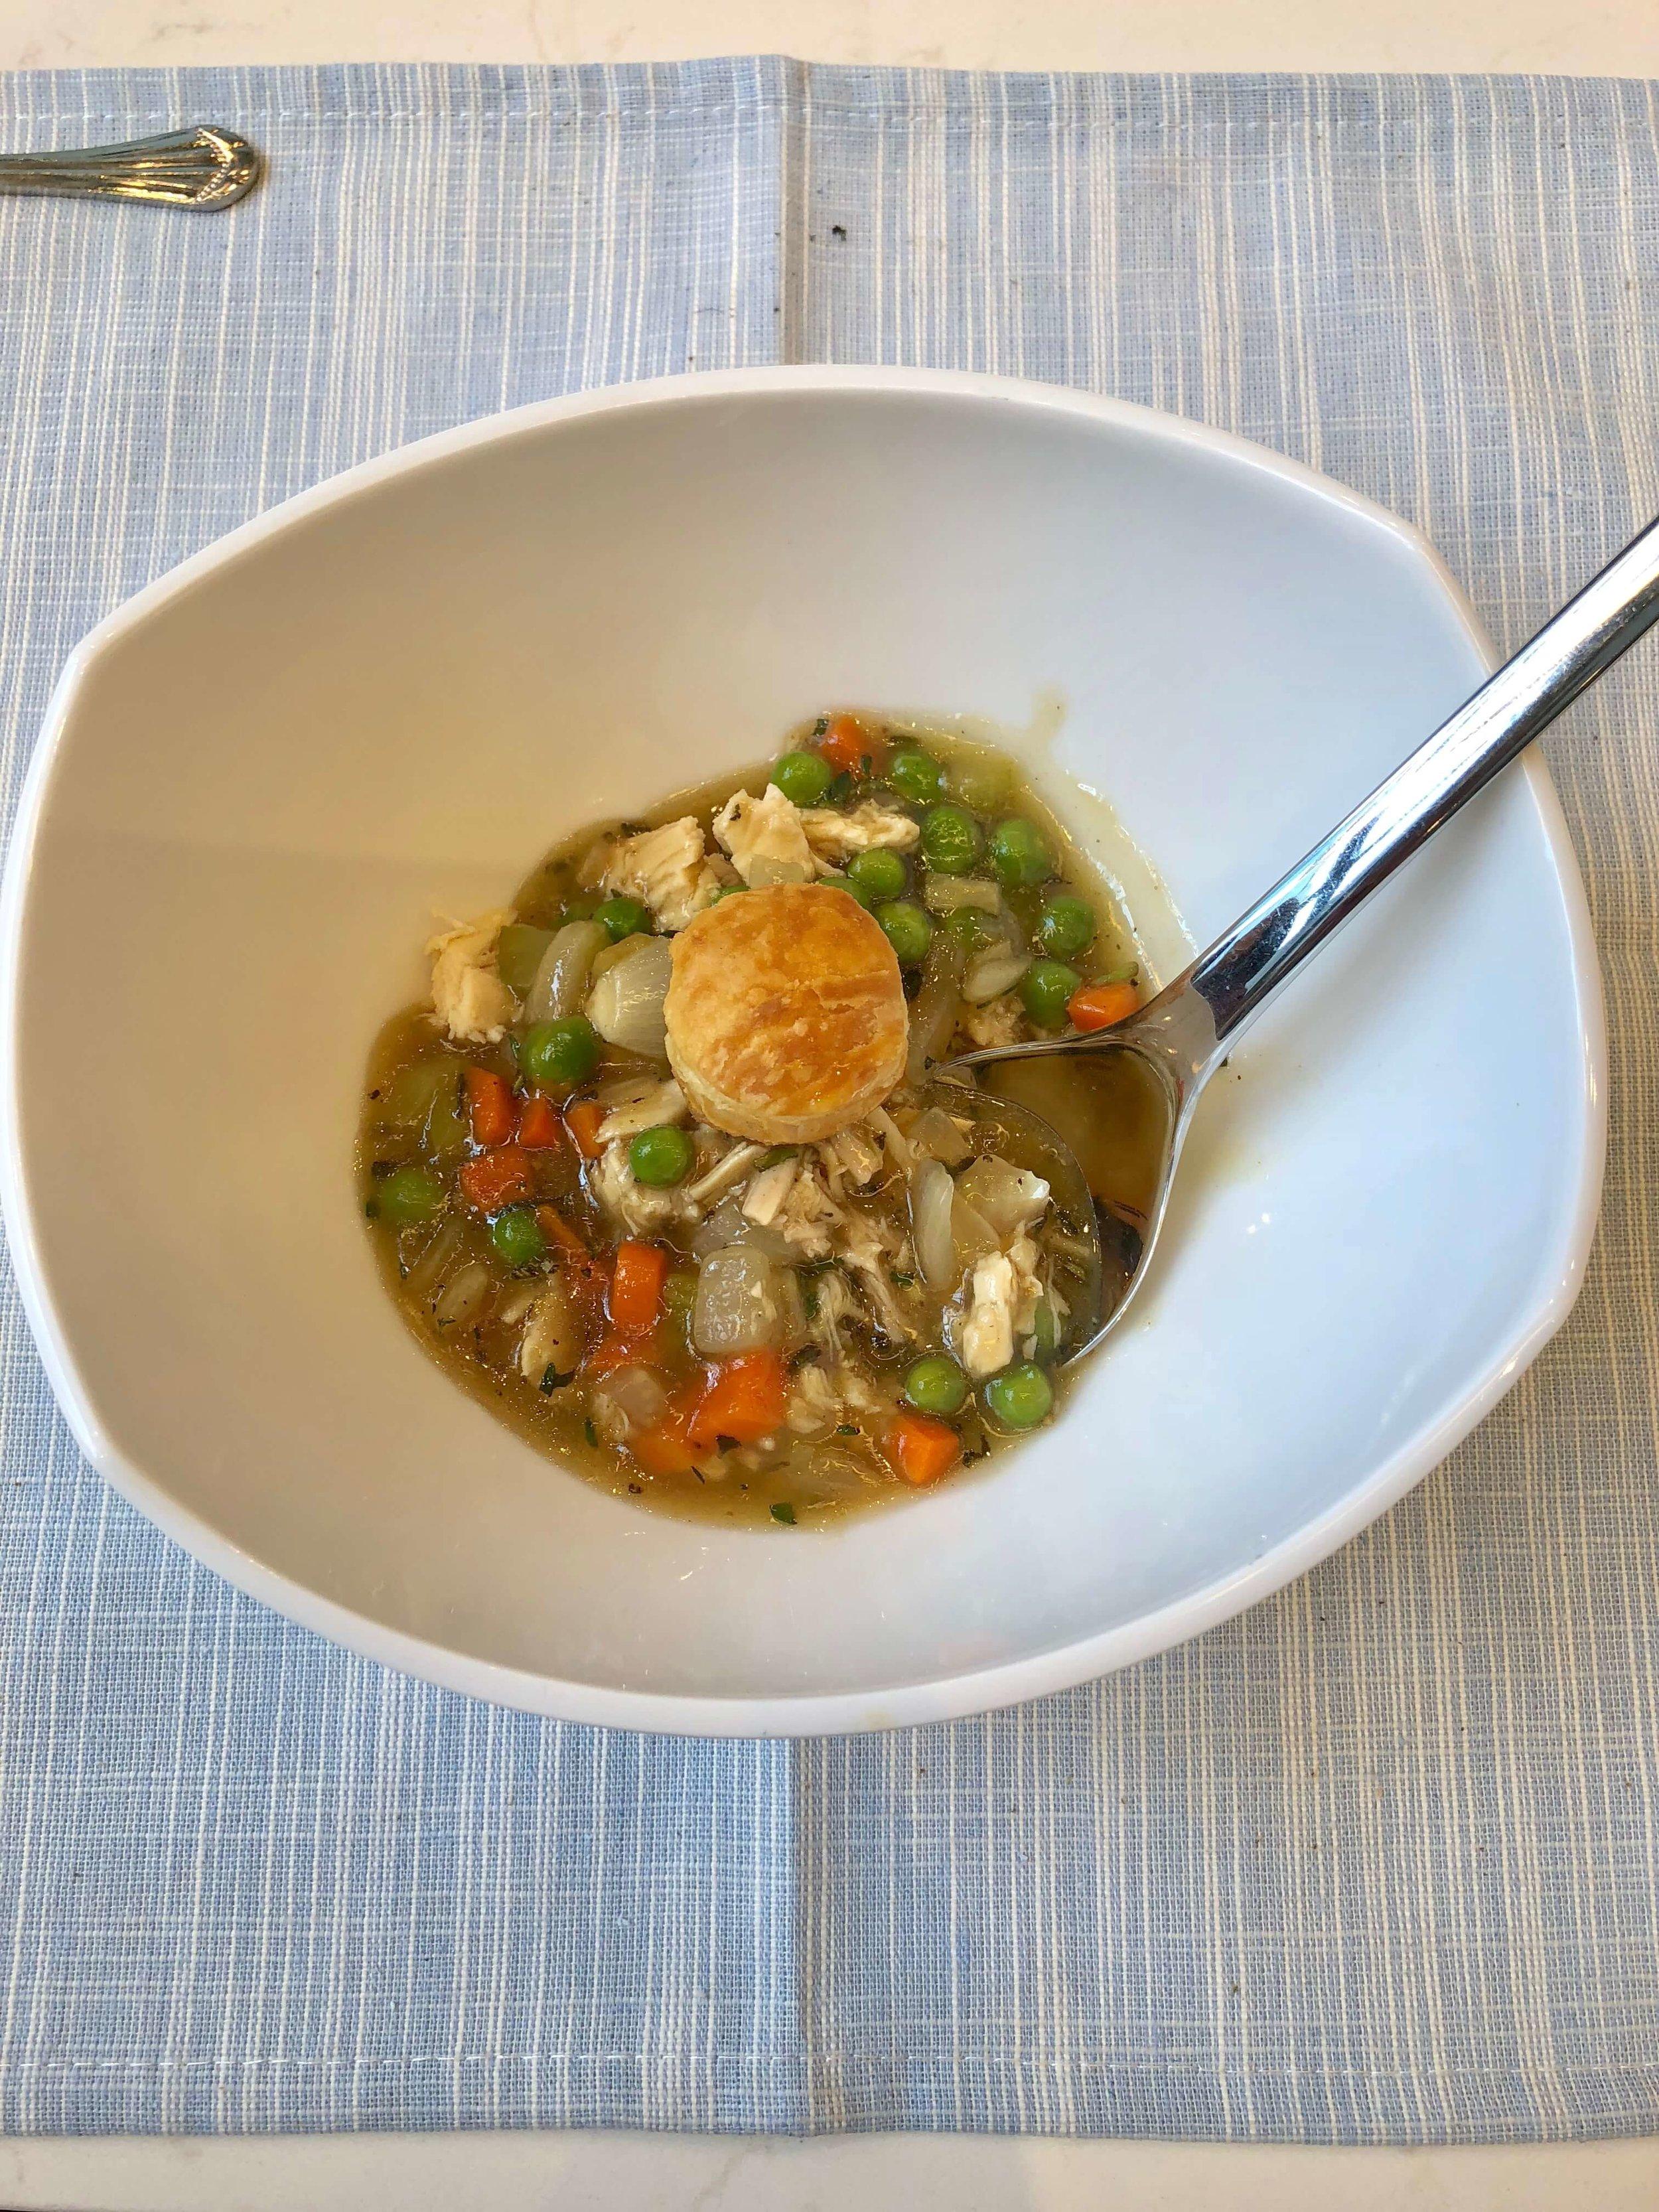 Yummy chicken stew from Chef Jon at the Monogram Appliances Showroom in Chicago #monogramappliances